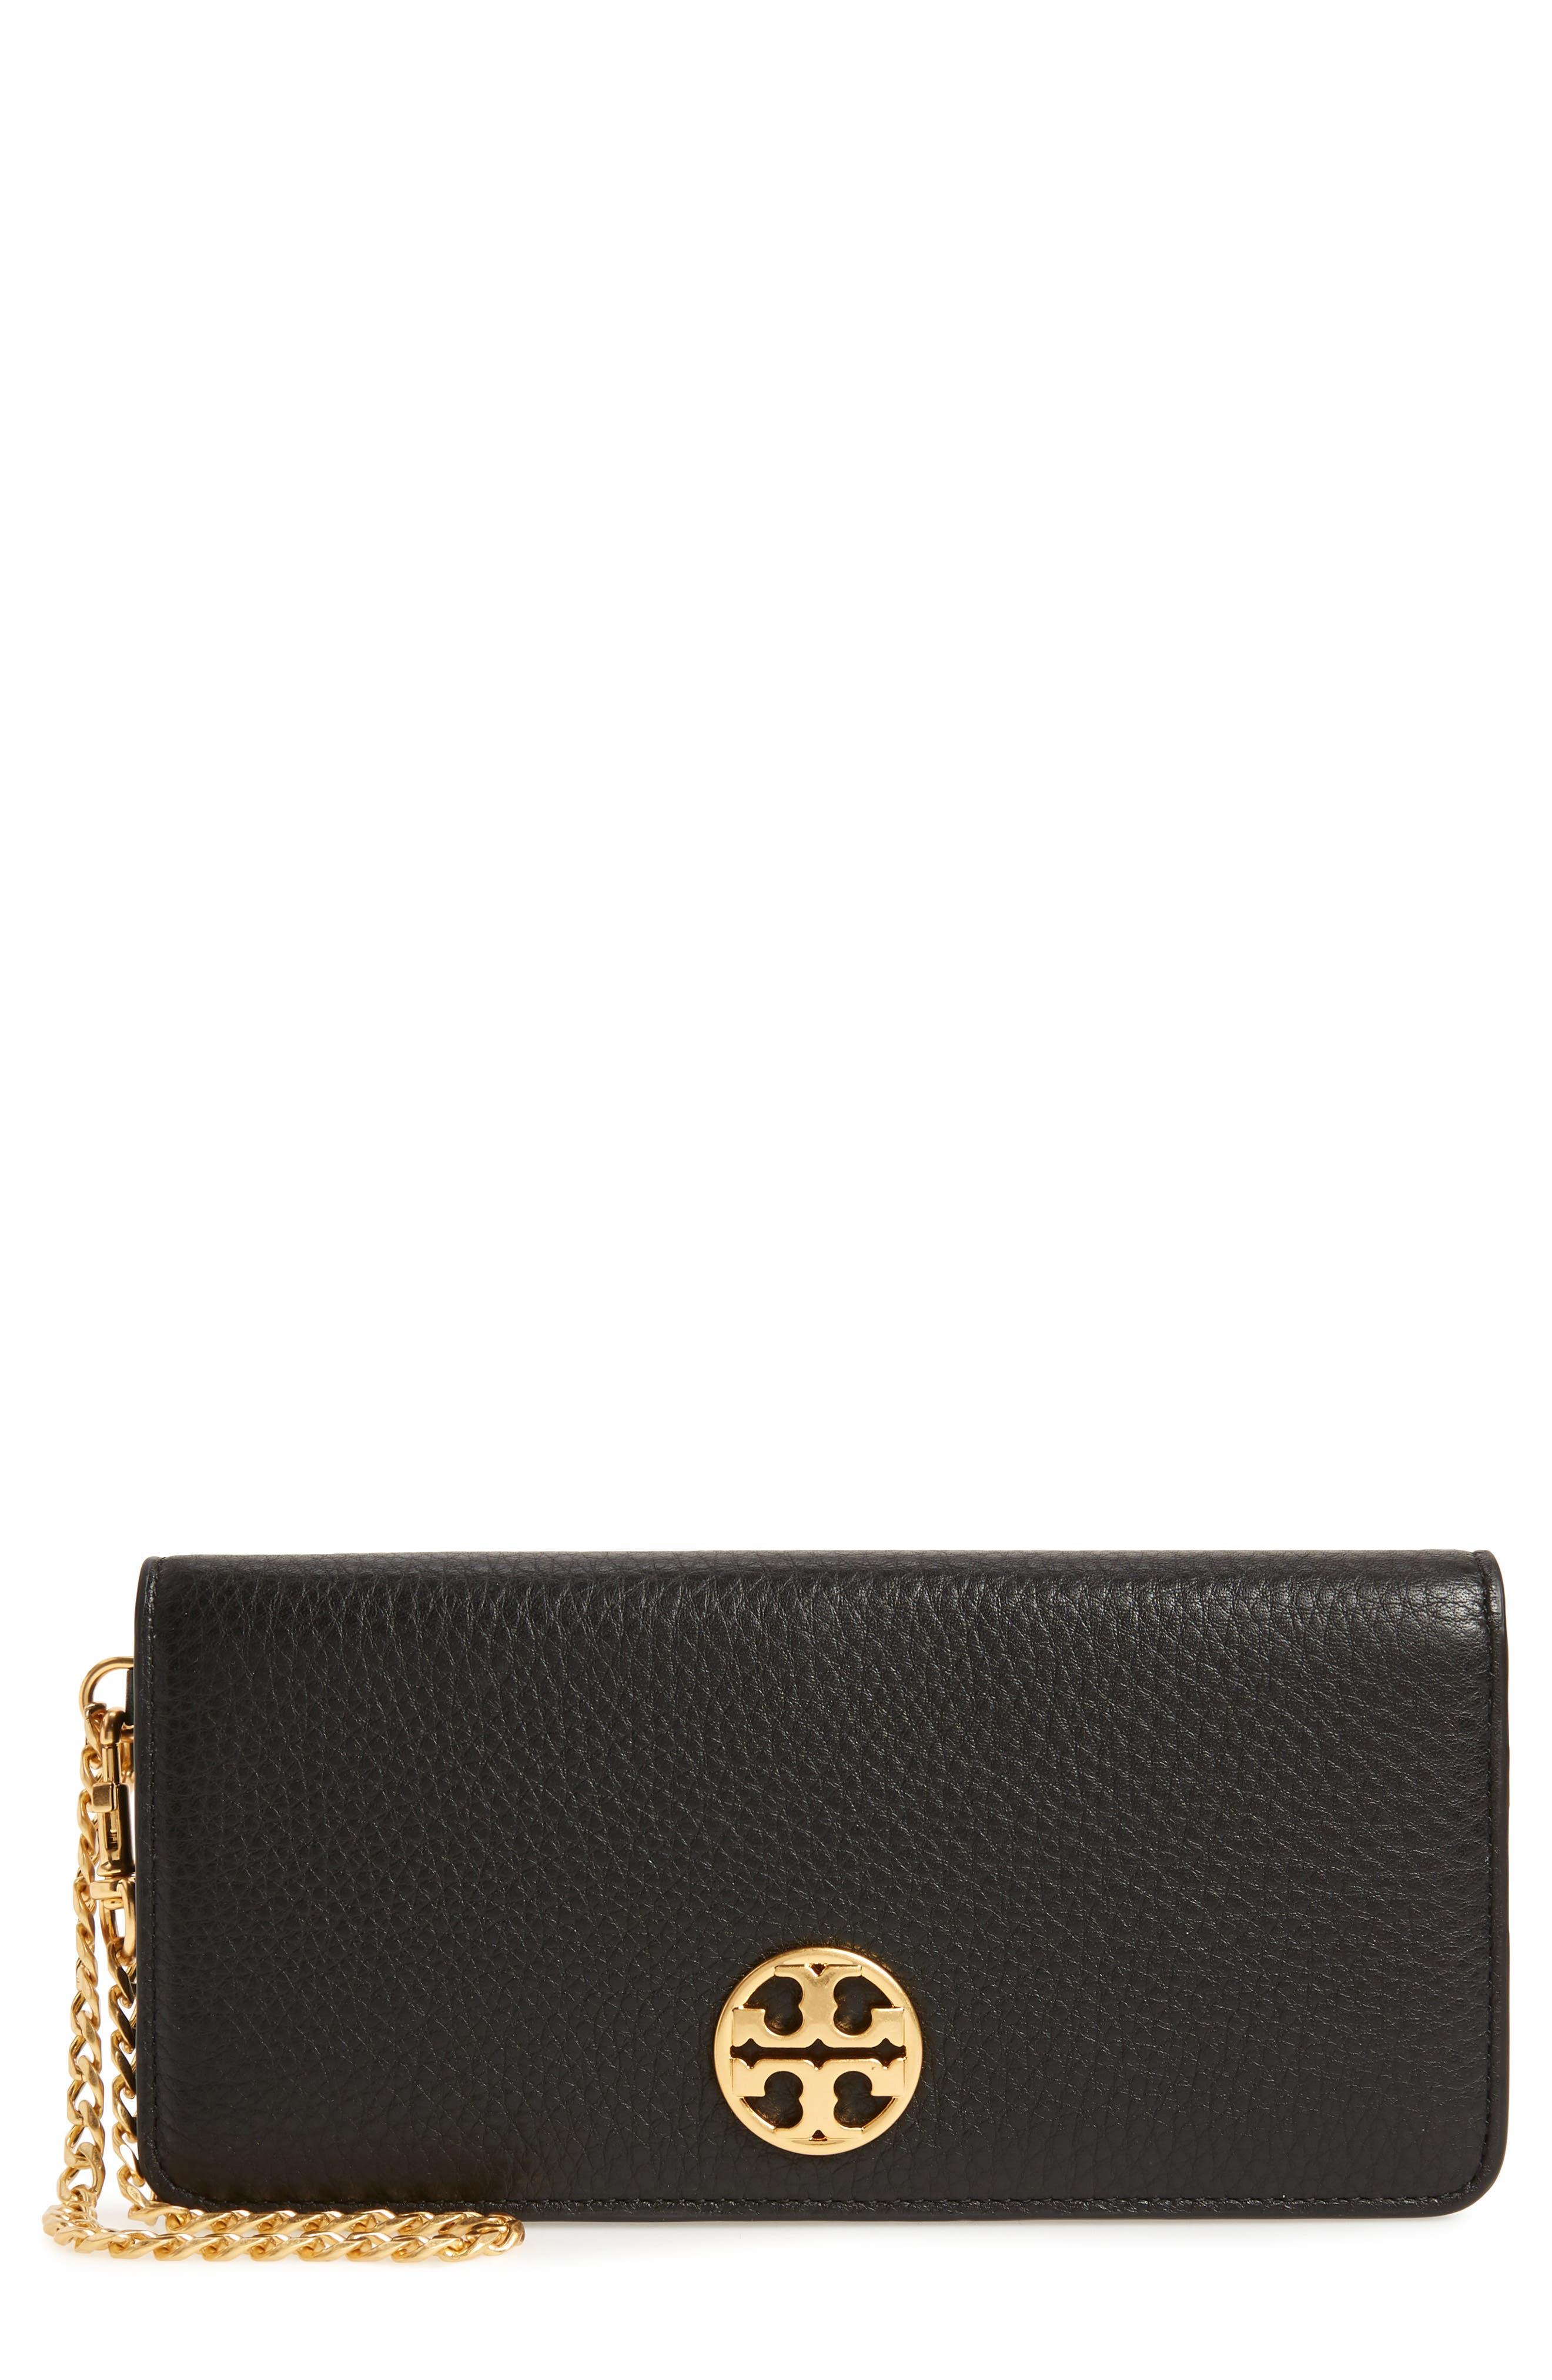 TORY BURCH Chelsea Leather Wristlet Wallet, Main, color, 001